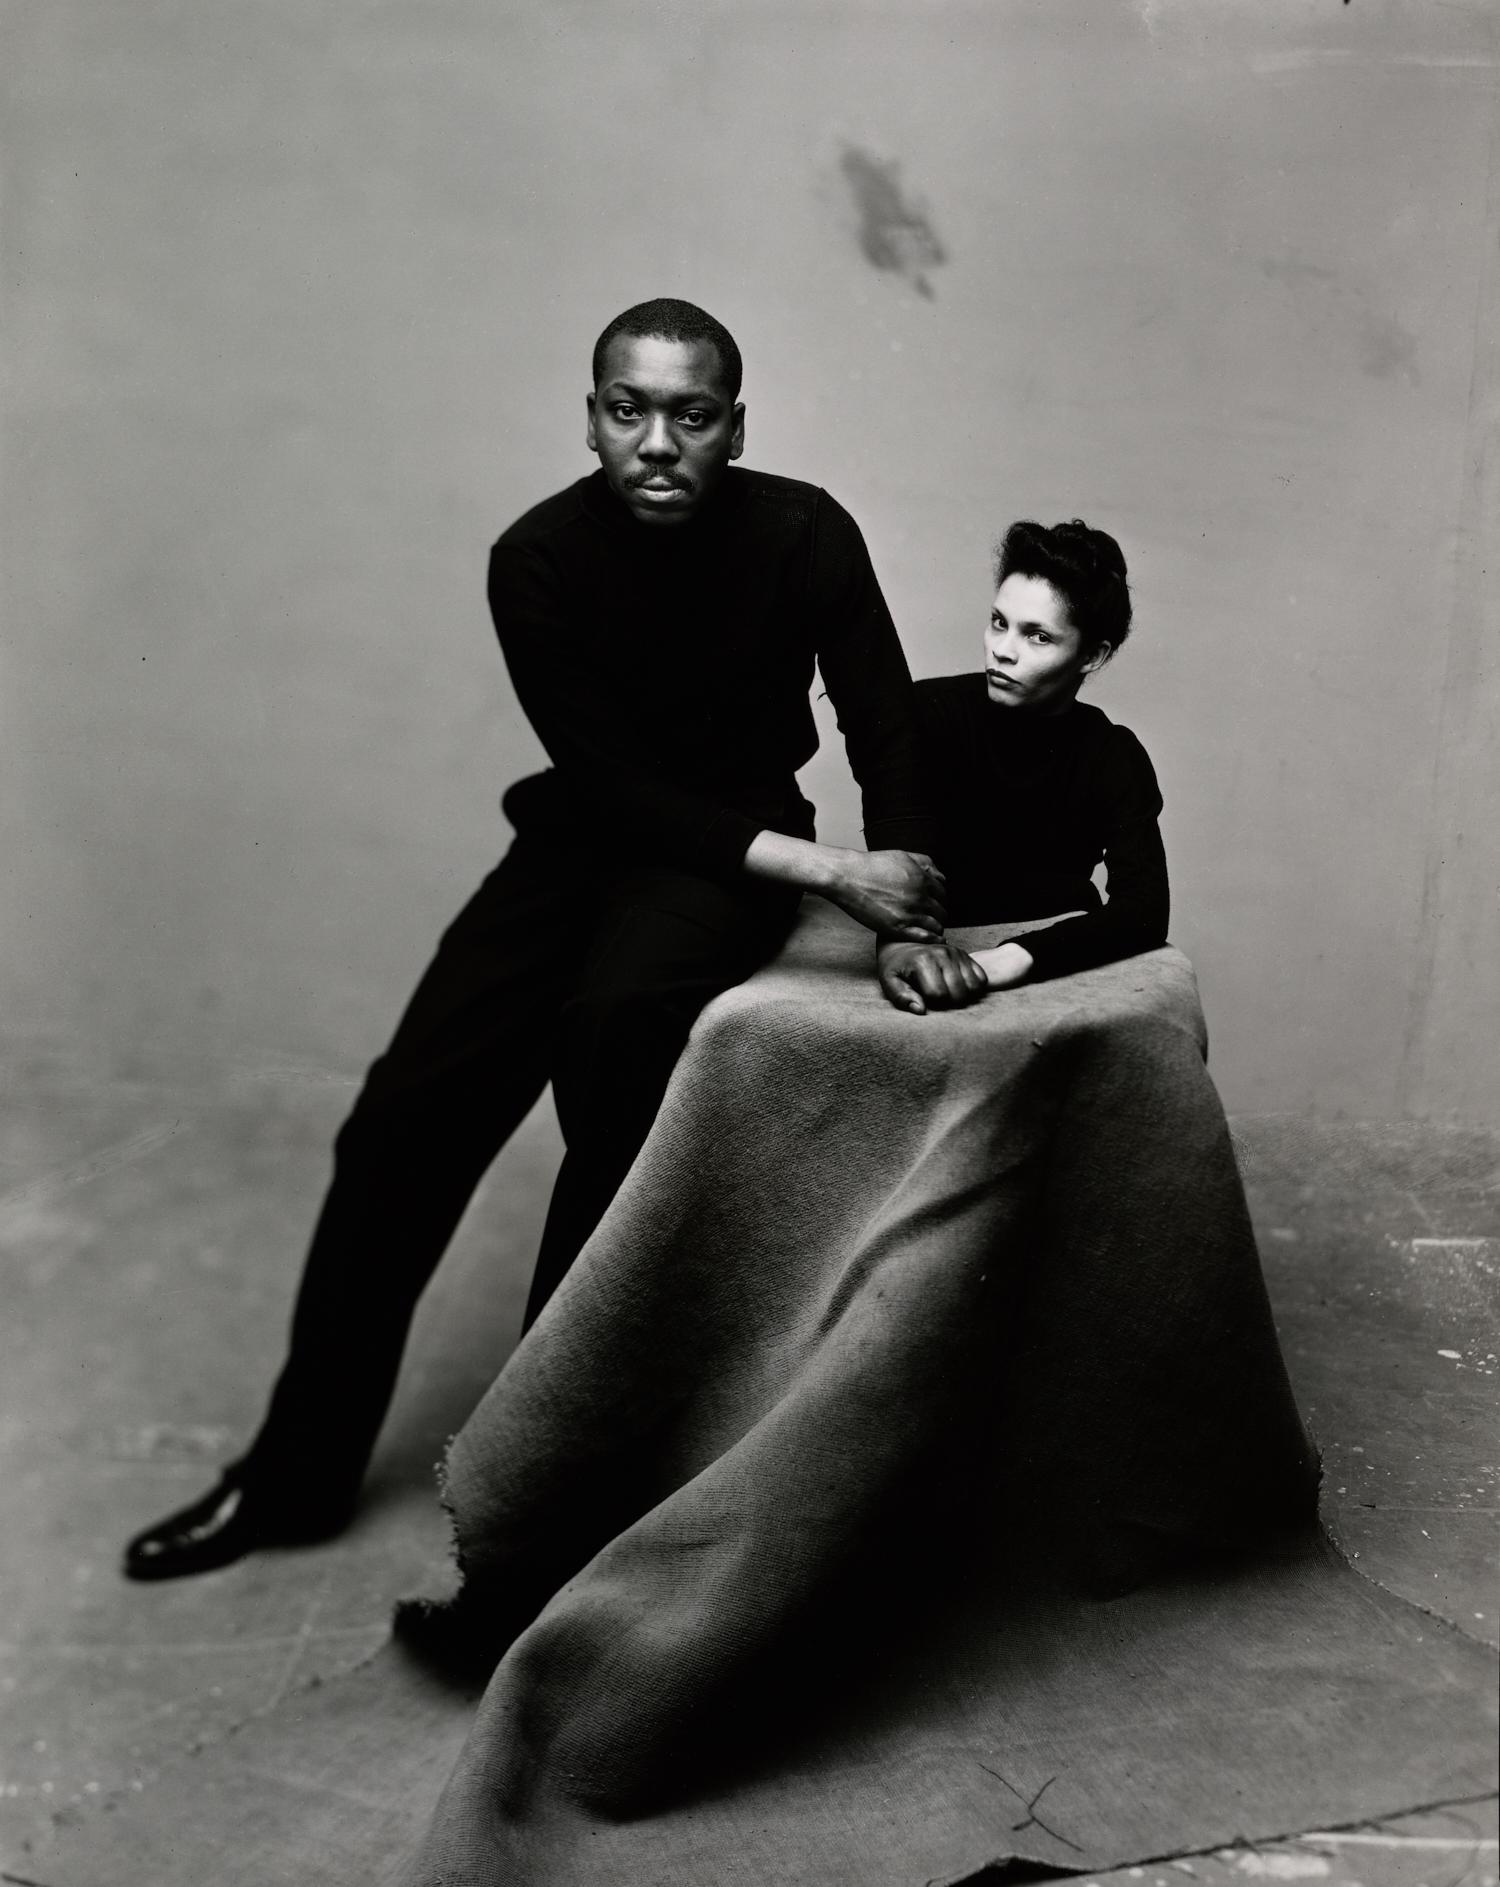 Mr. and Mrs. Jacob Lawrence , New York, 1947 Gelatin silver print © Condé Nast